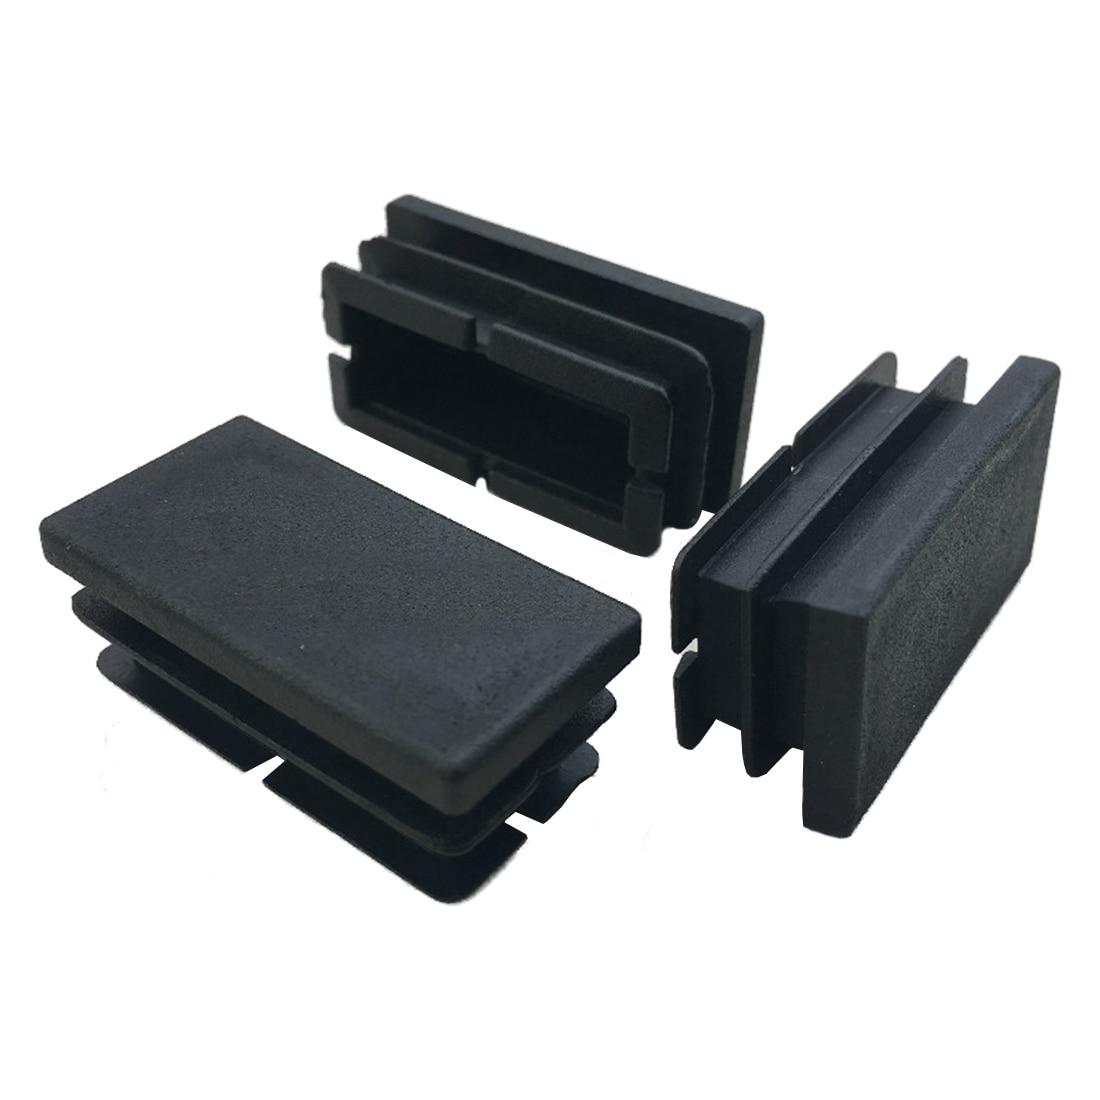 4 x Black Plastic Blanking End Tube Caps Inserts Plug Bung Rectangle 30mm x 15mm